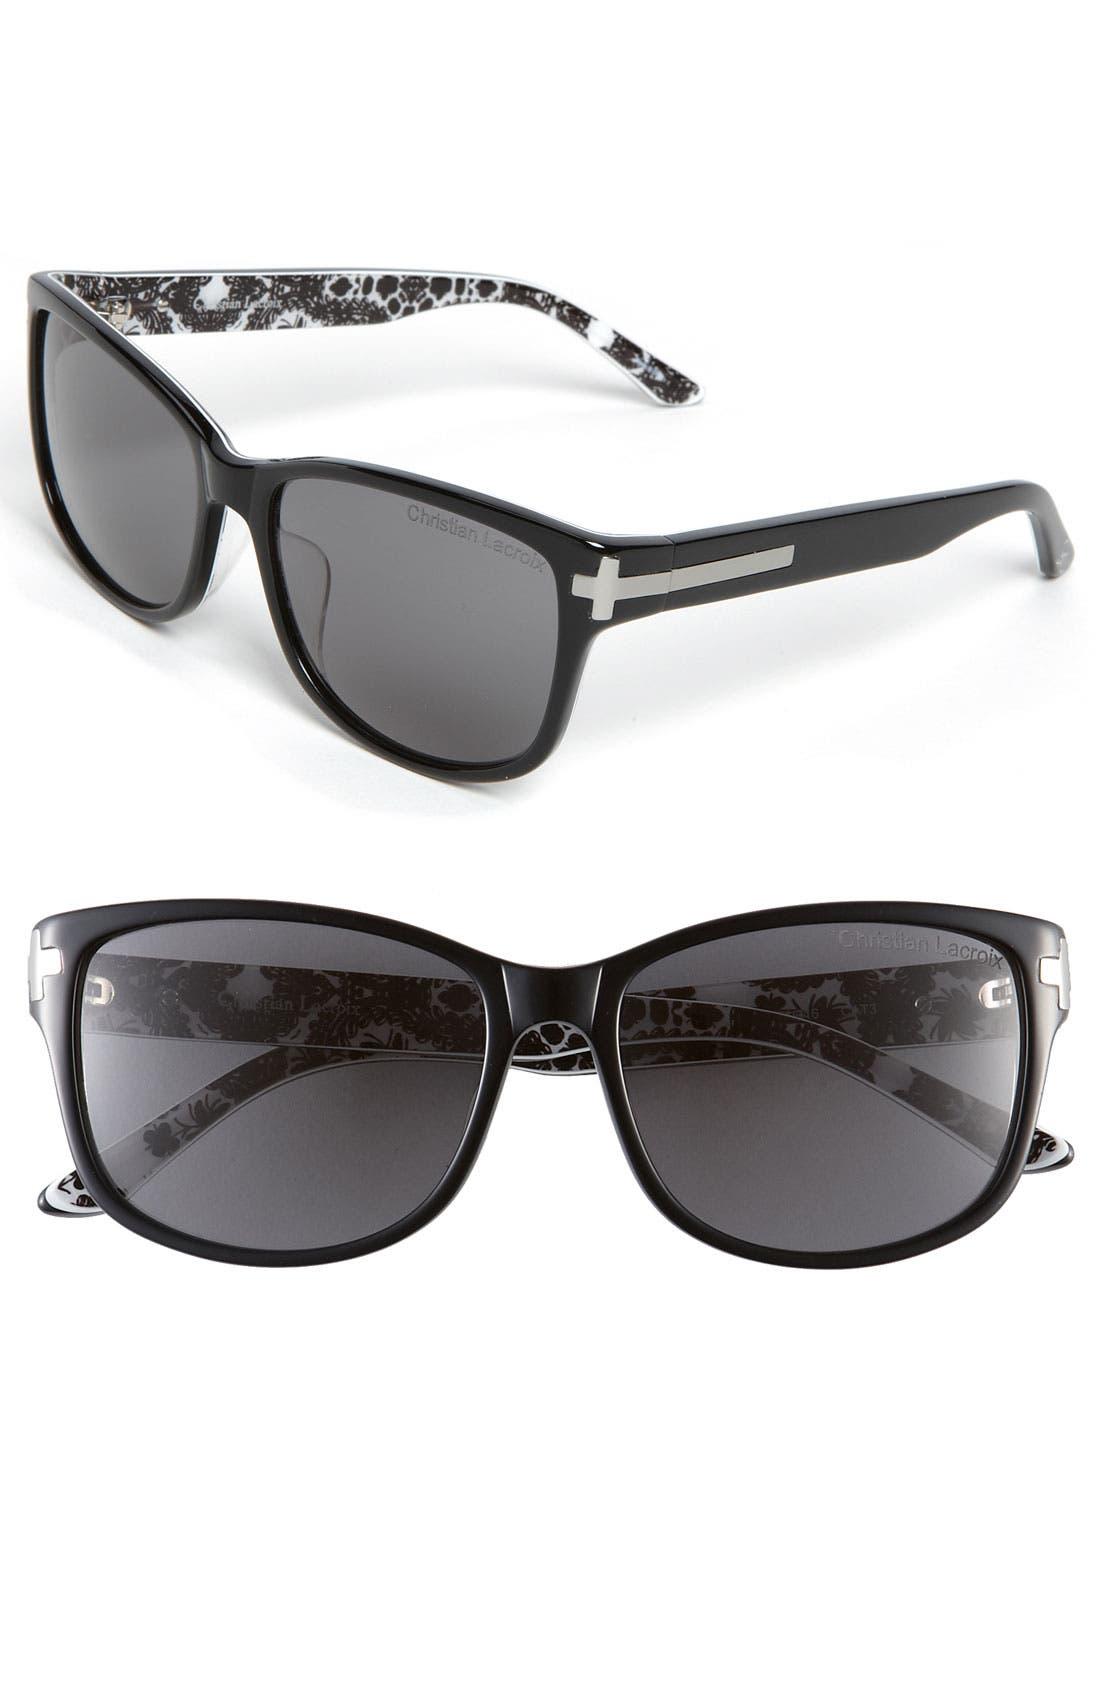 CHRISTIAN LACROIX,                             Sunglasses,                             Main thumbnail 1, color,                             001